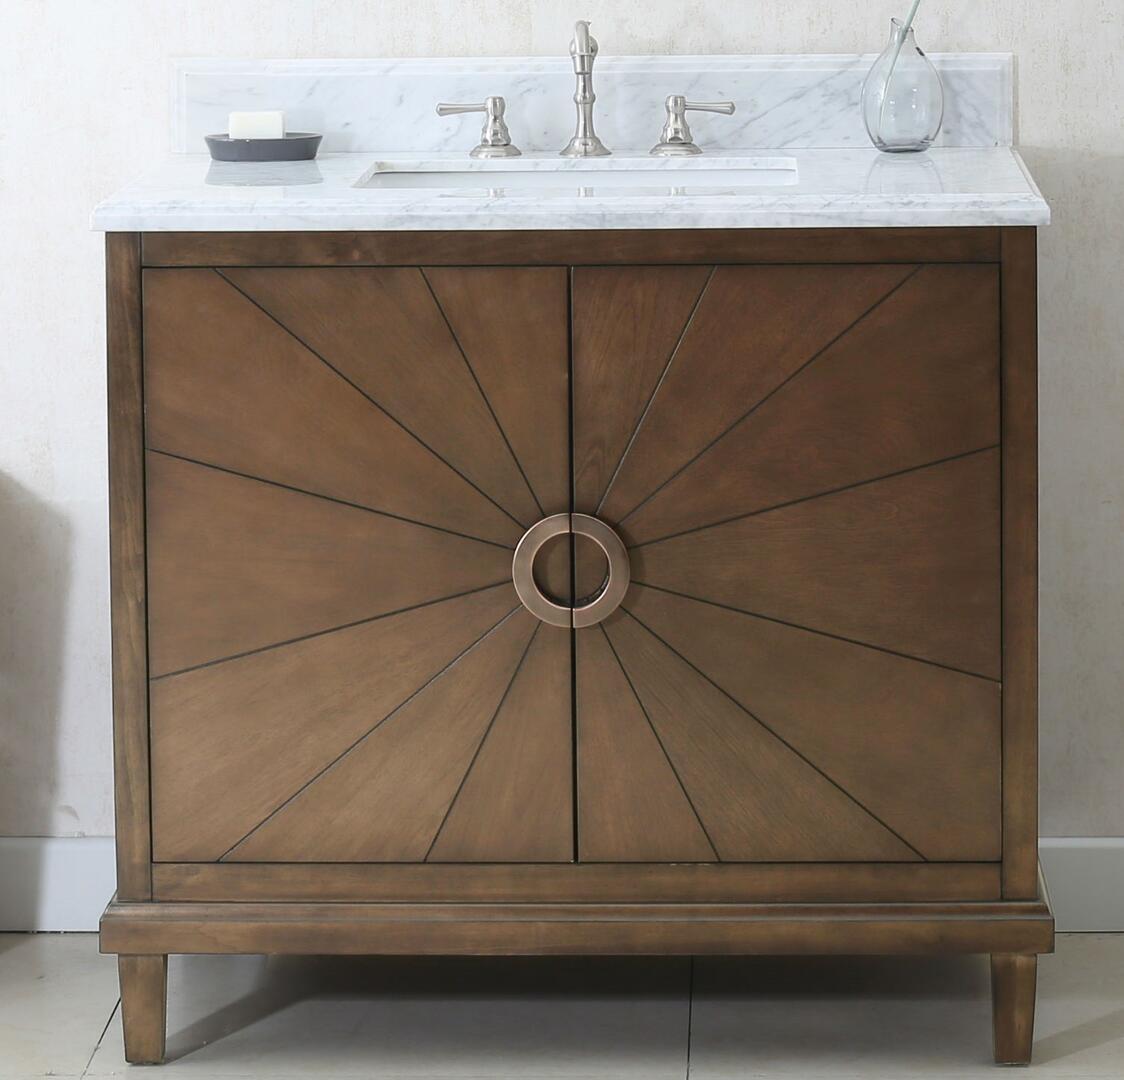 legion faucet yhst no sink gray furniture vanity g